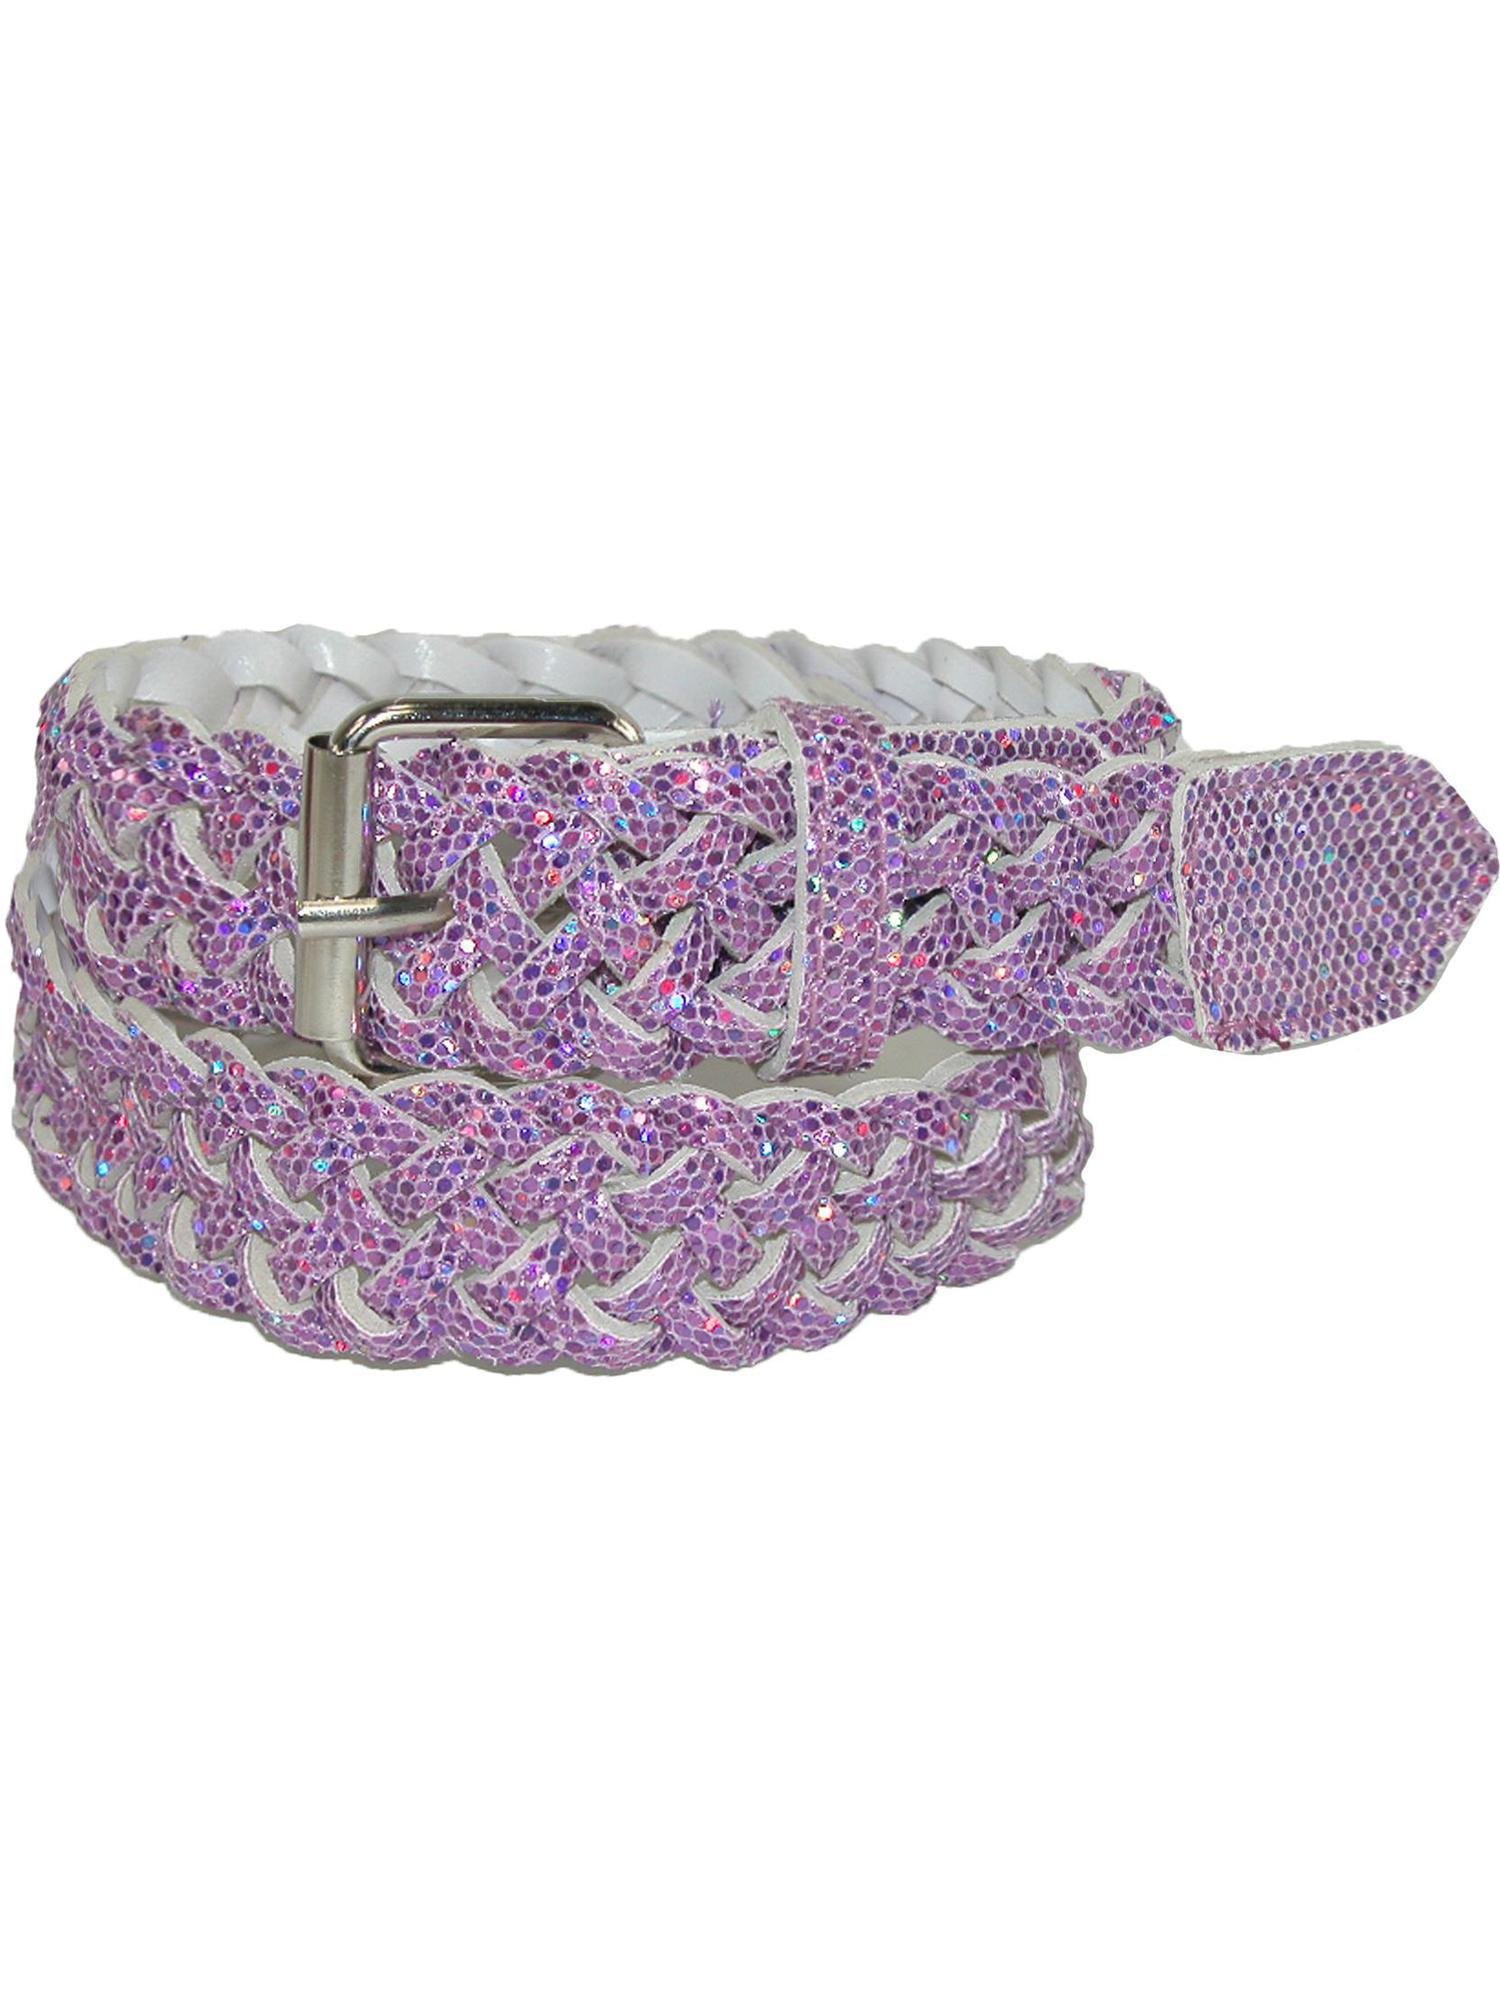 Girls' Metallic Braided Belt